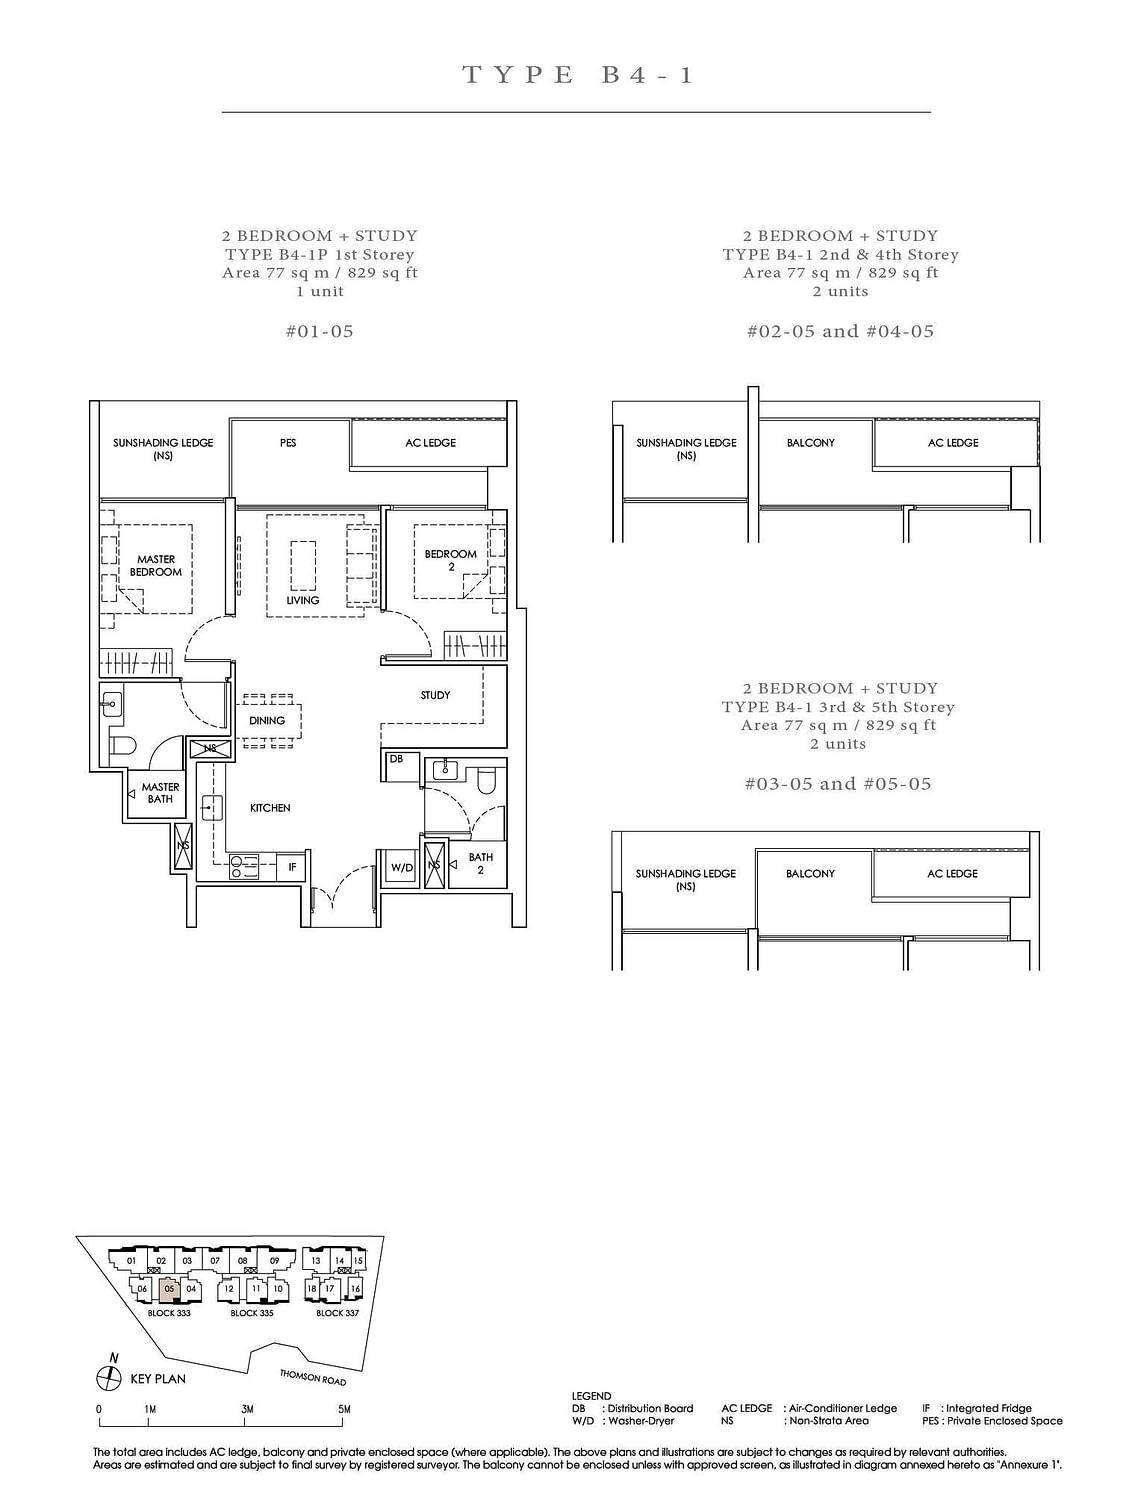 Peak Residence Peak Residence Floorplan B4 1